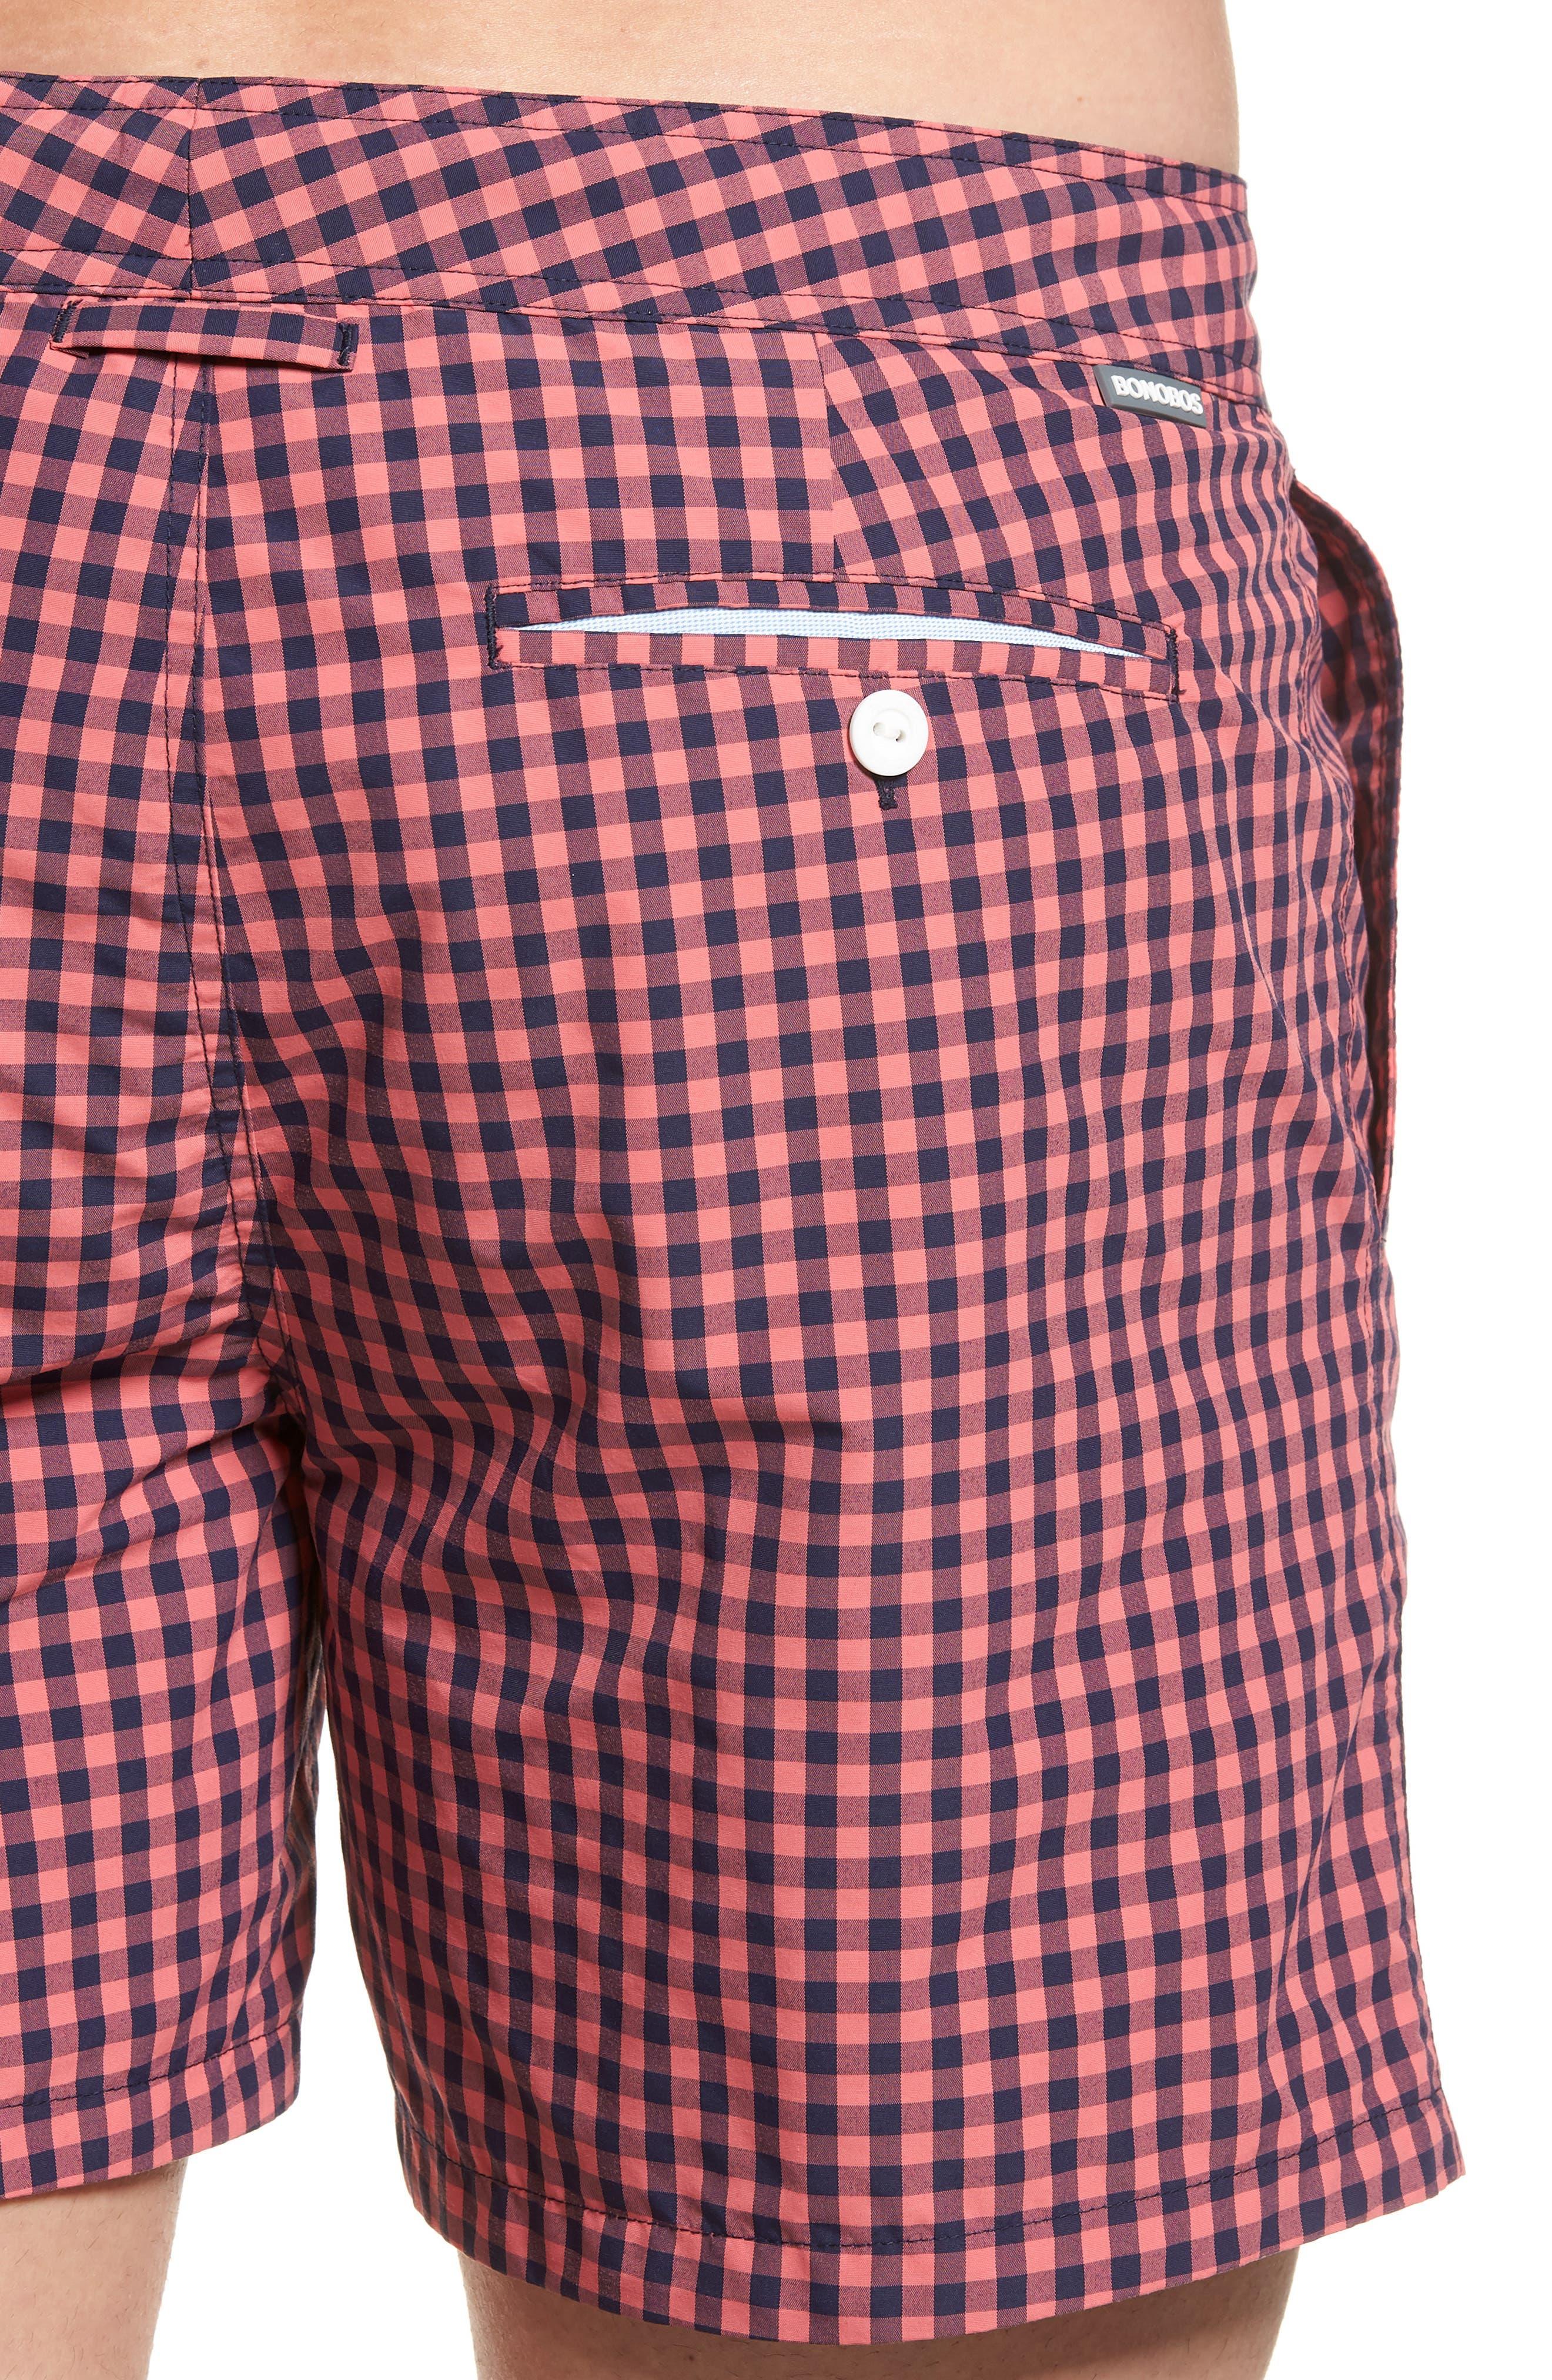 Gingham 5-Inch Swim Trunks,                             Alternate thumbnail 4, color,                             Gulfstream Gingham Blue/ Pink